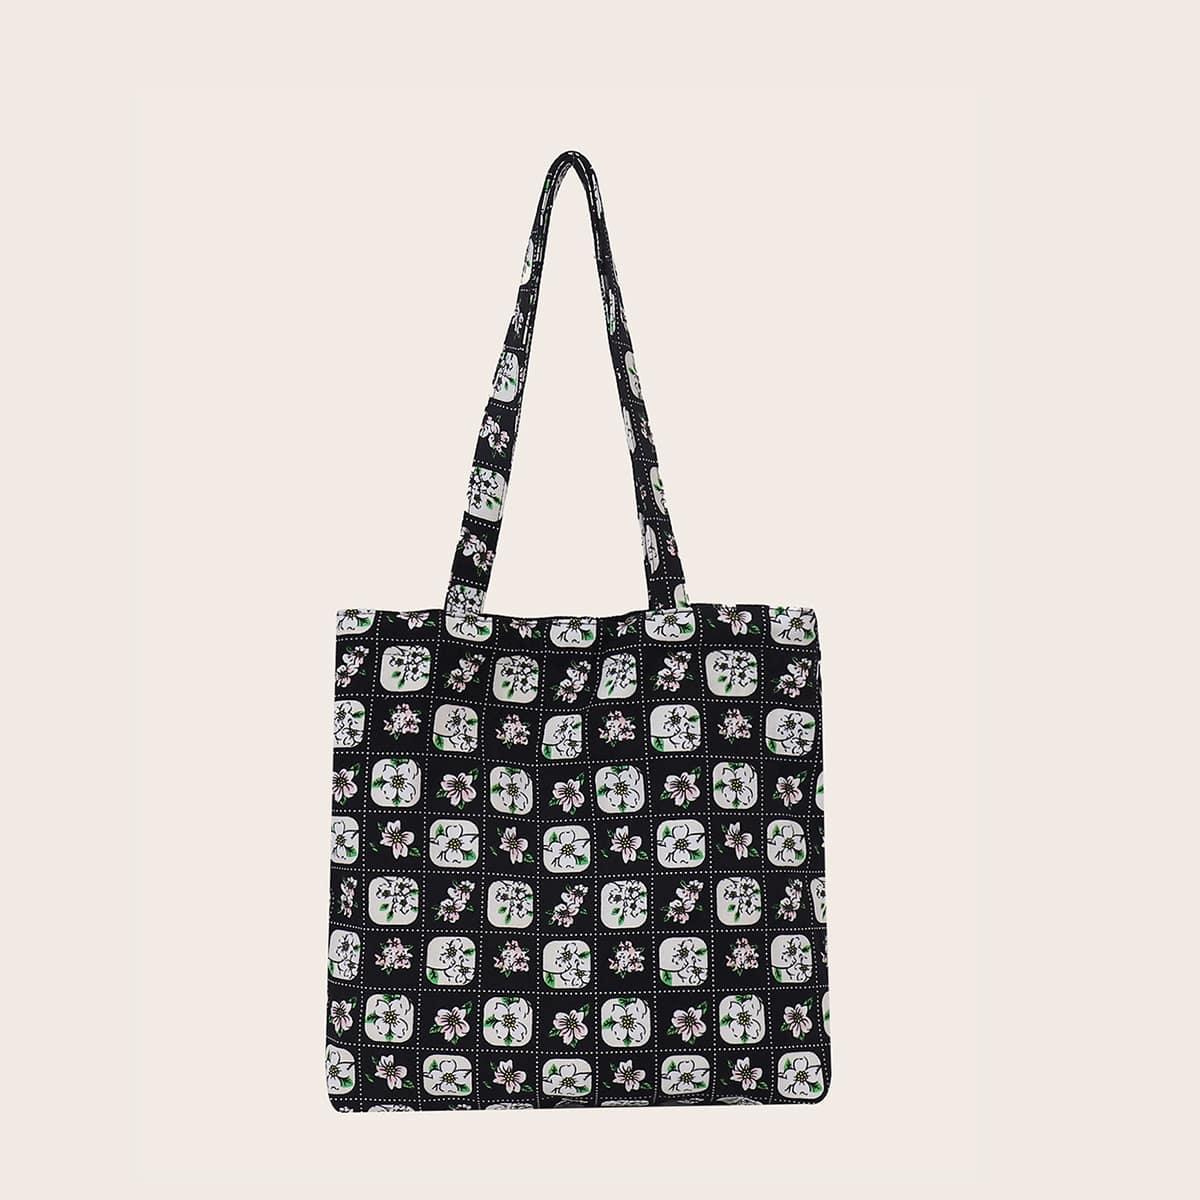 Allover Floral Graphic Shopper Bag